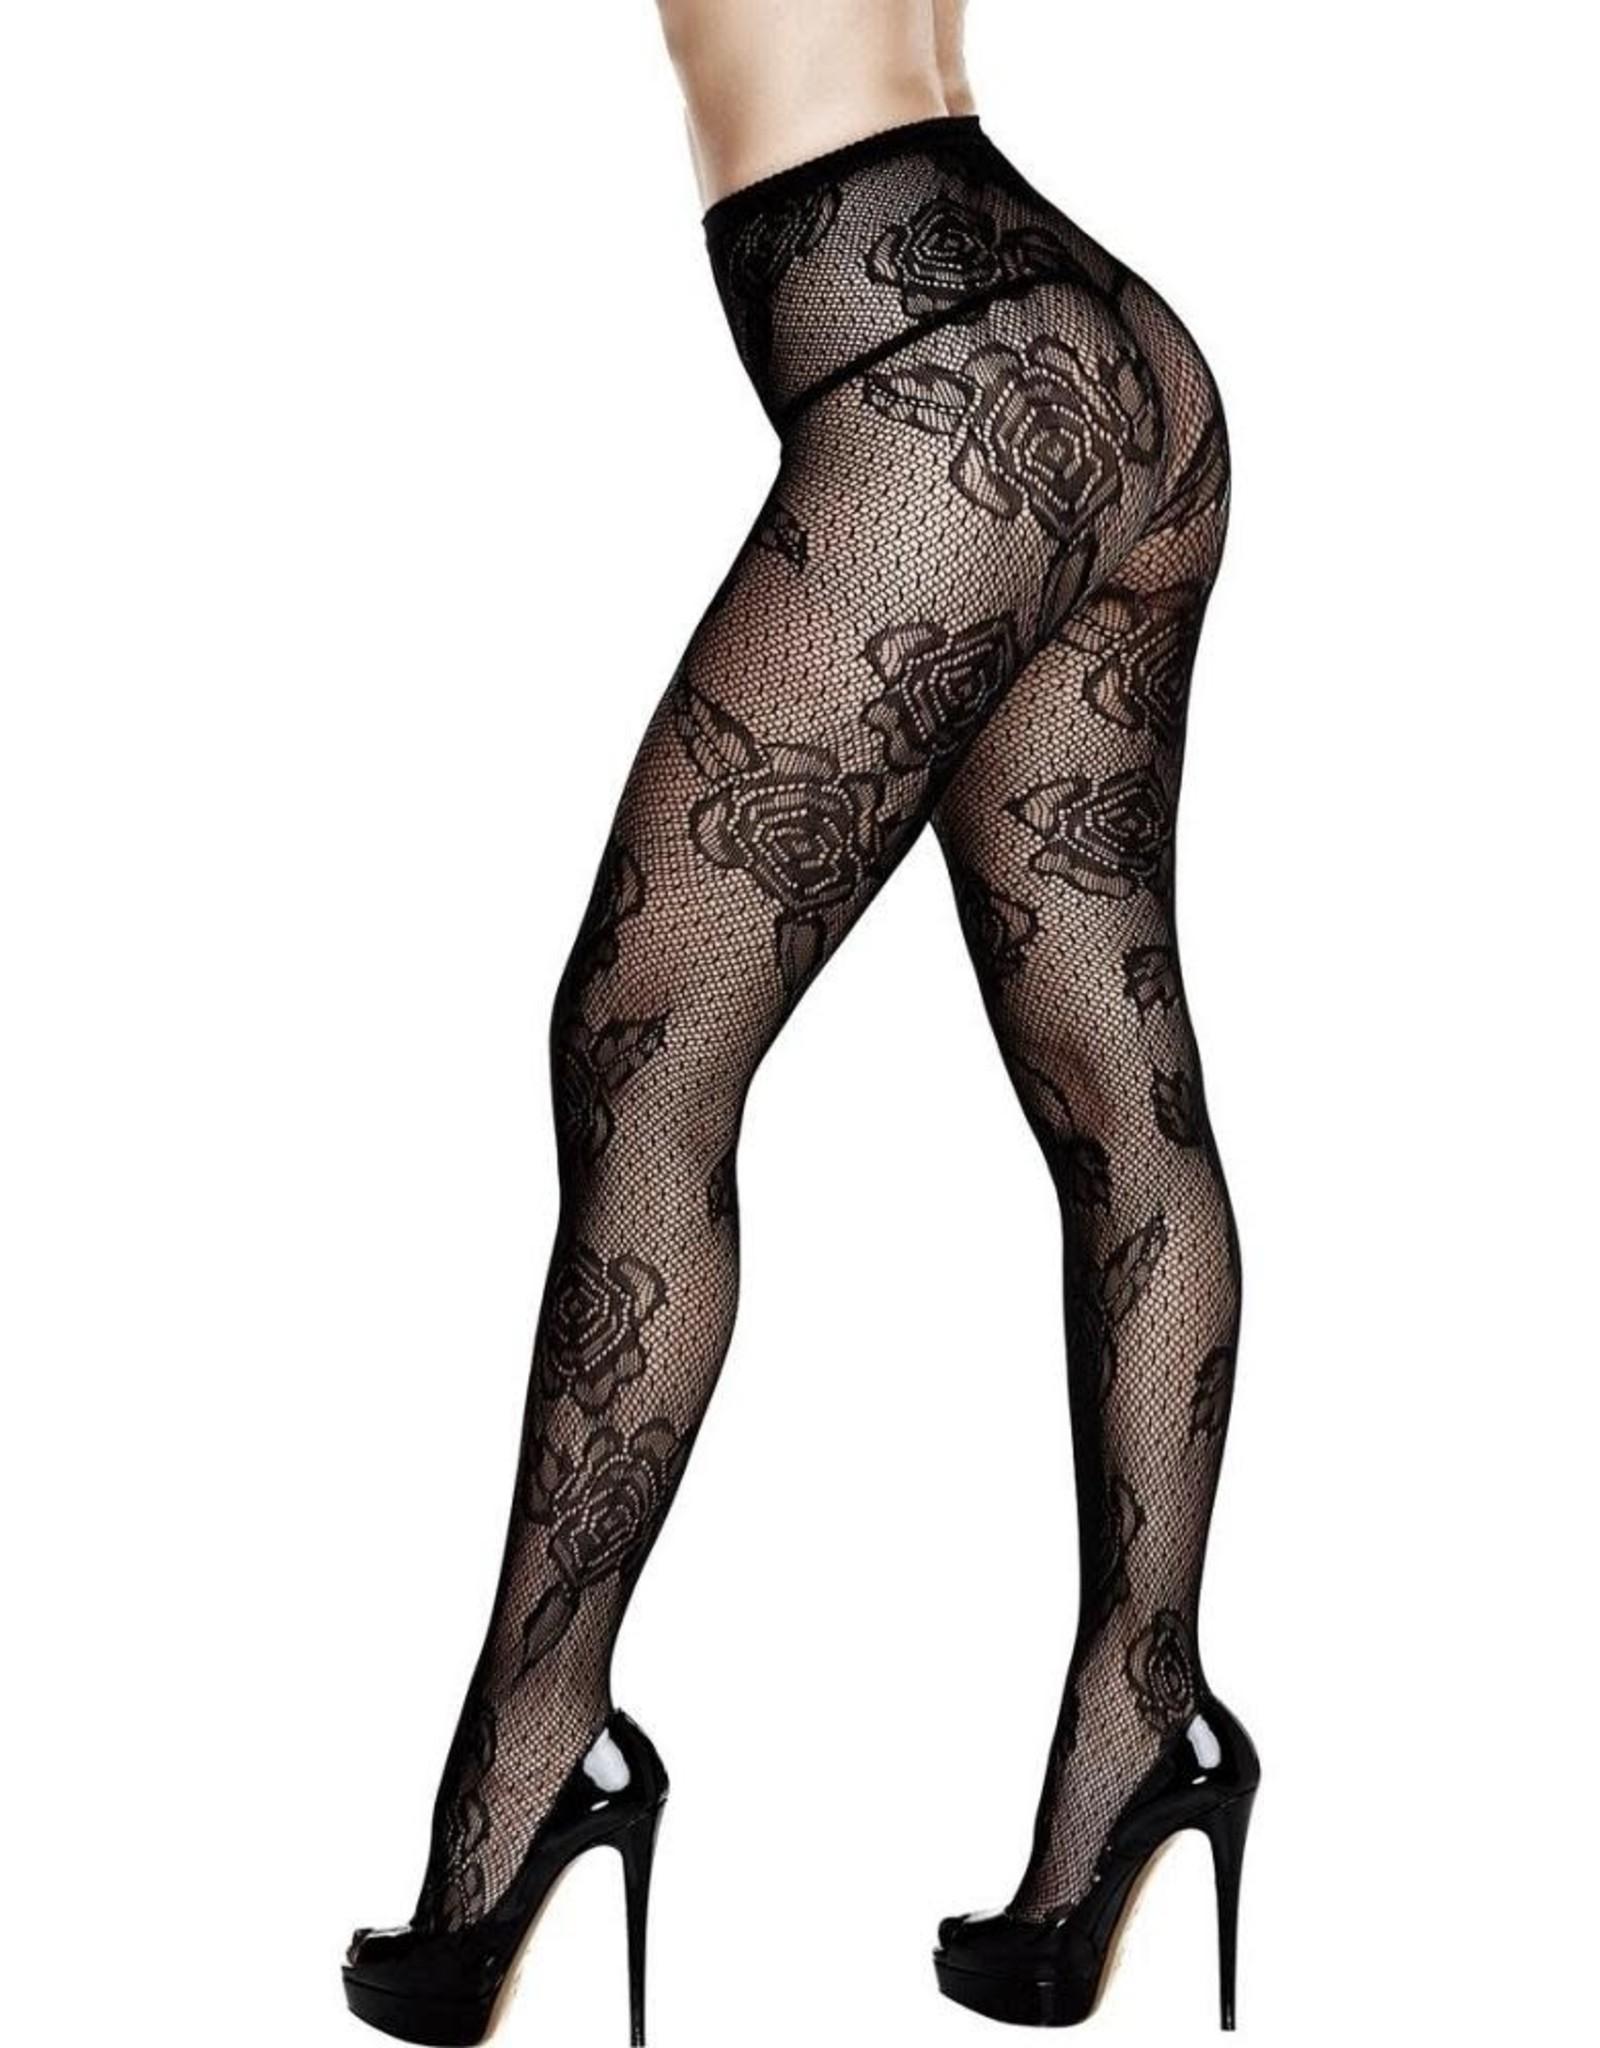 Baci Black Dotted Floral Lace Pantyhose OS/XL